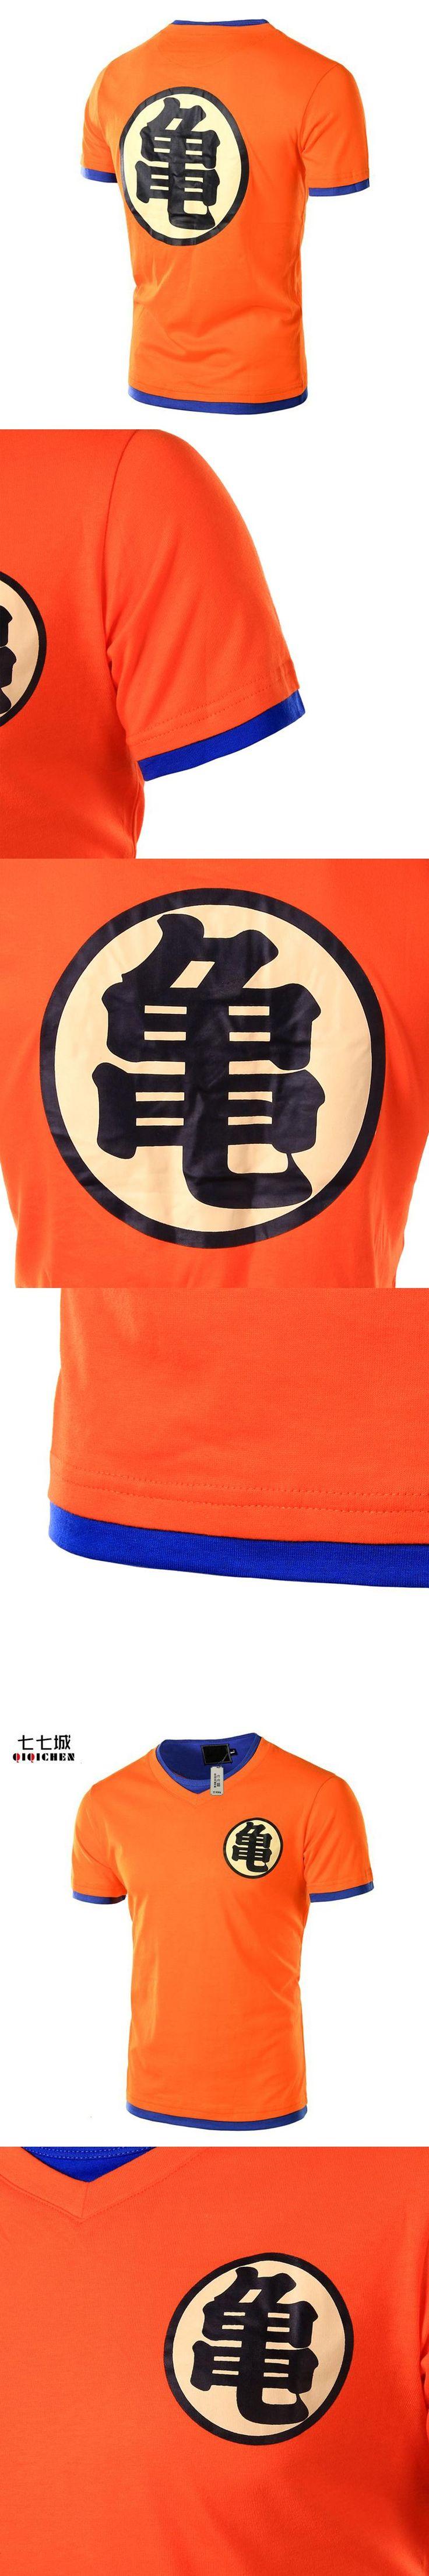 T Shirt Cosplay Men 2017 New Arrival Fashion Dragon Ball Design  Quality Fun T-Shirt Men Tshirt Homme XXL